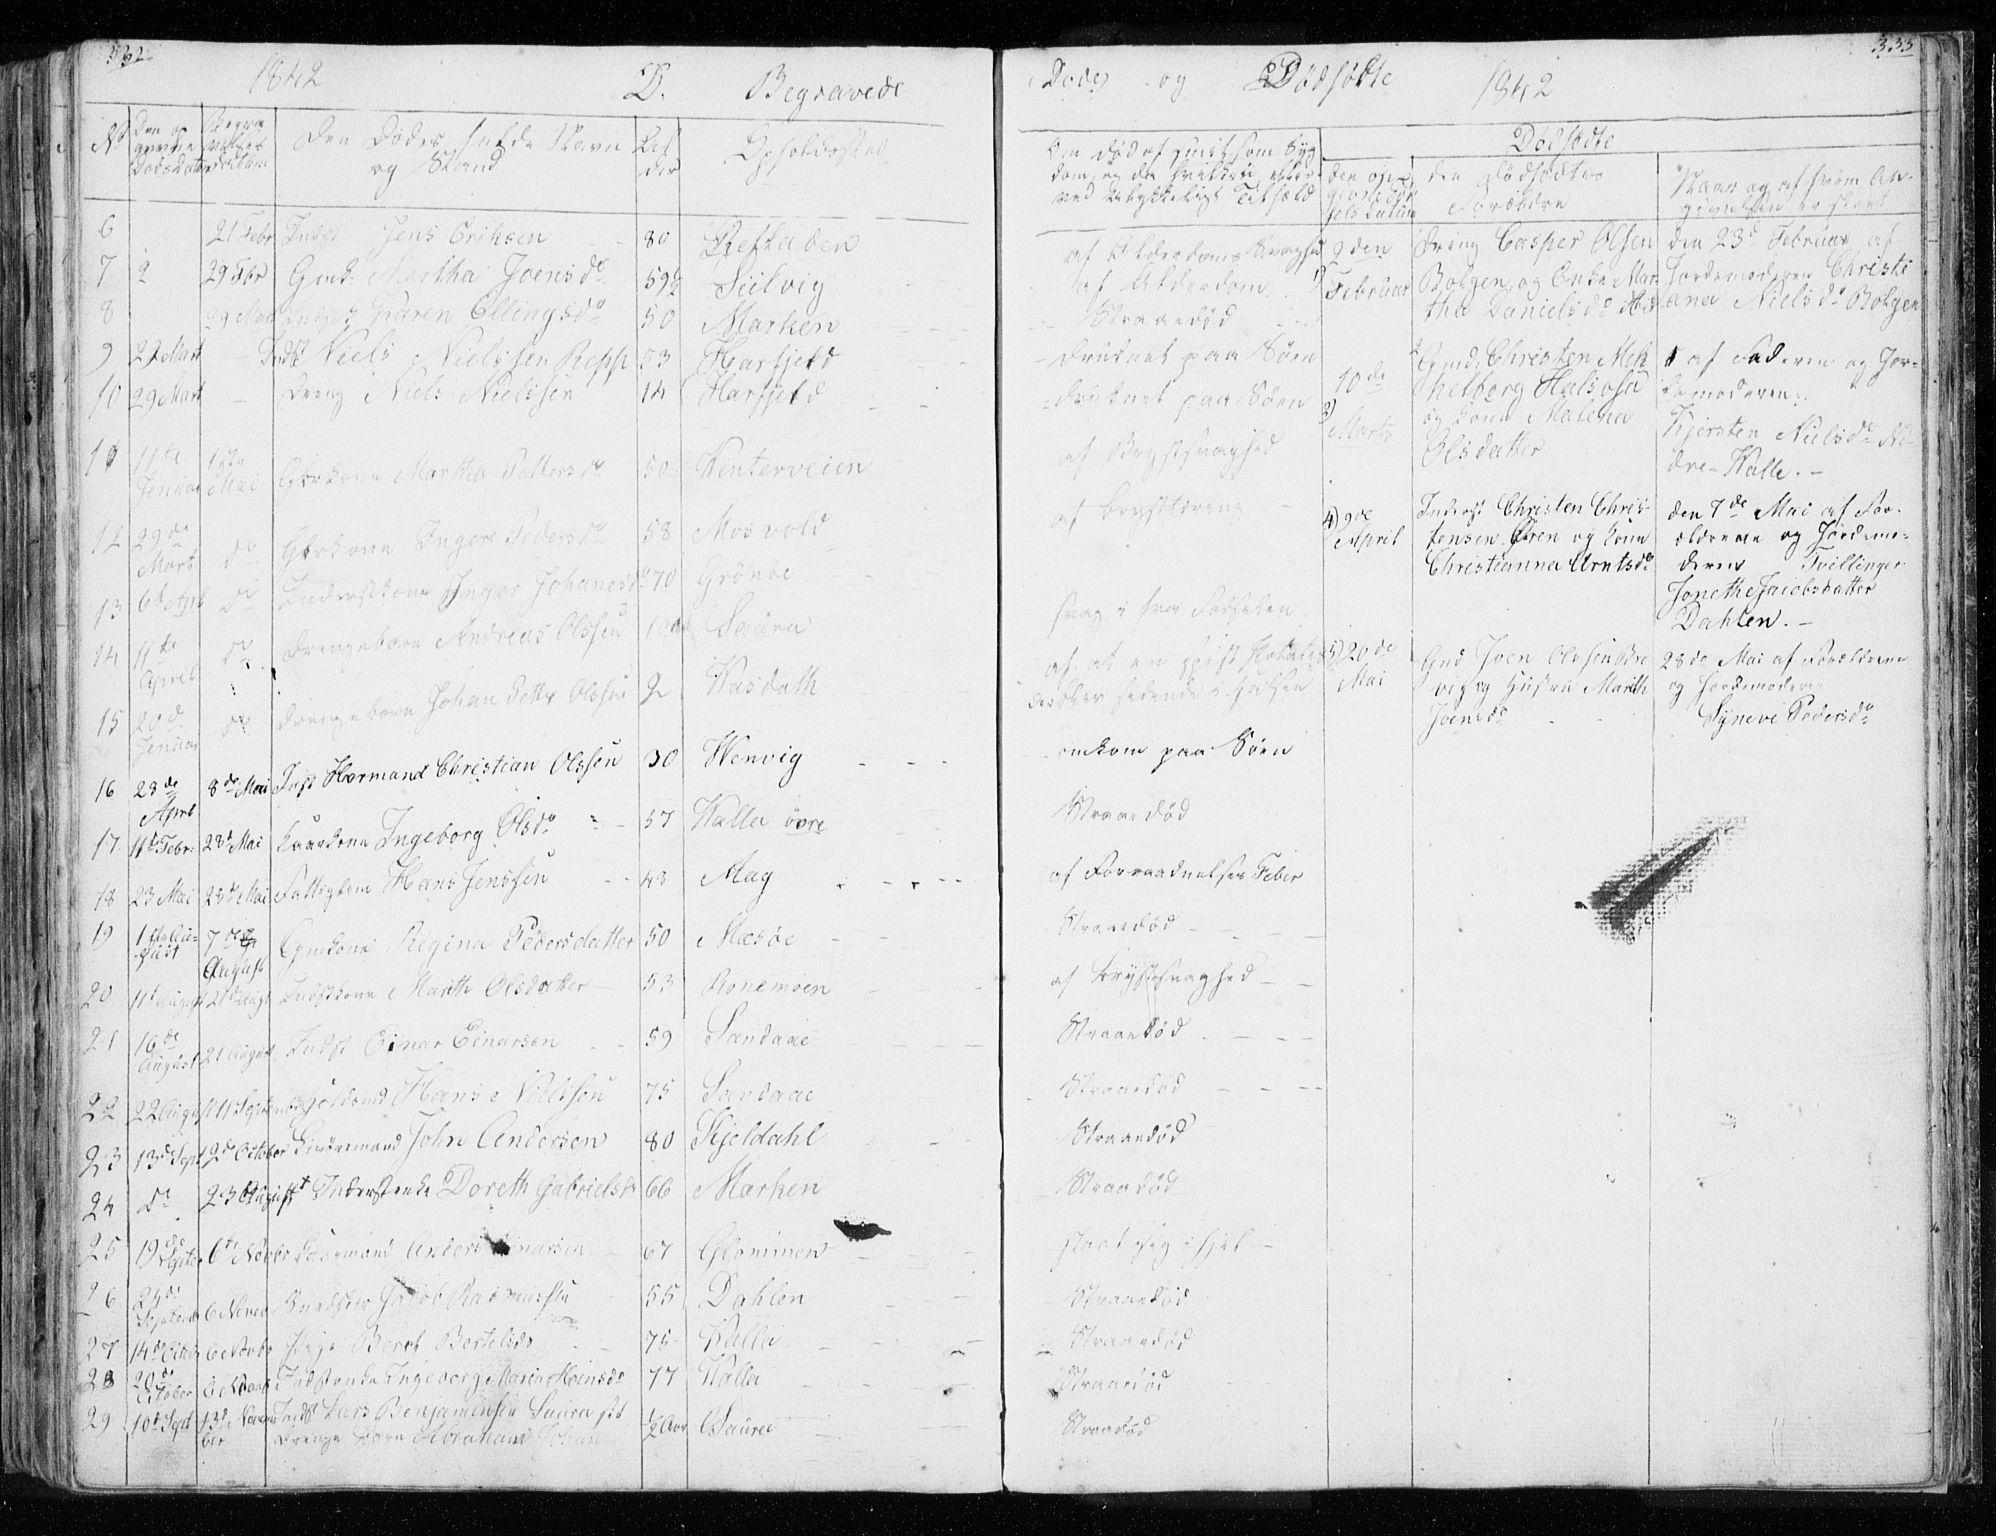 SAT, Ministerialprotokoller, klokkerbøker og fødselsregistre - Nordland, 843/L0632: Klokkerbok nr. 843C01, 1833-1853, s. 332-333